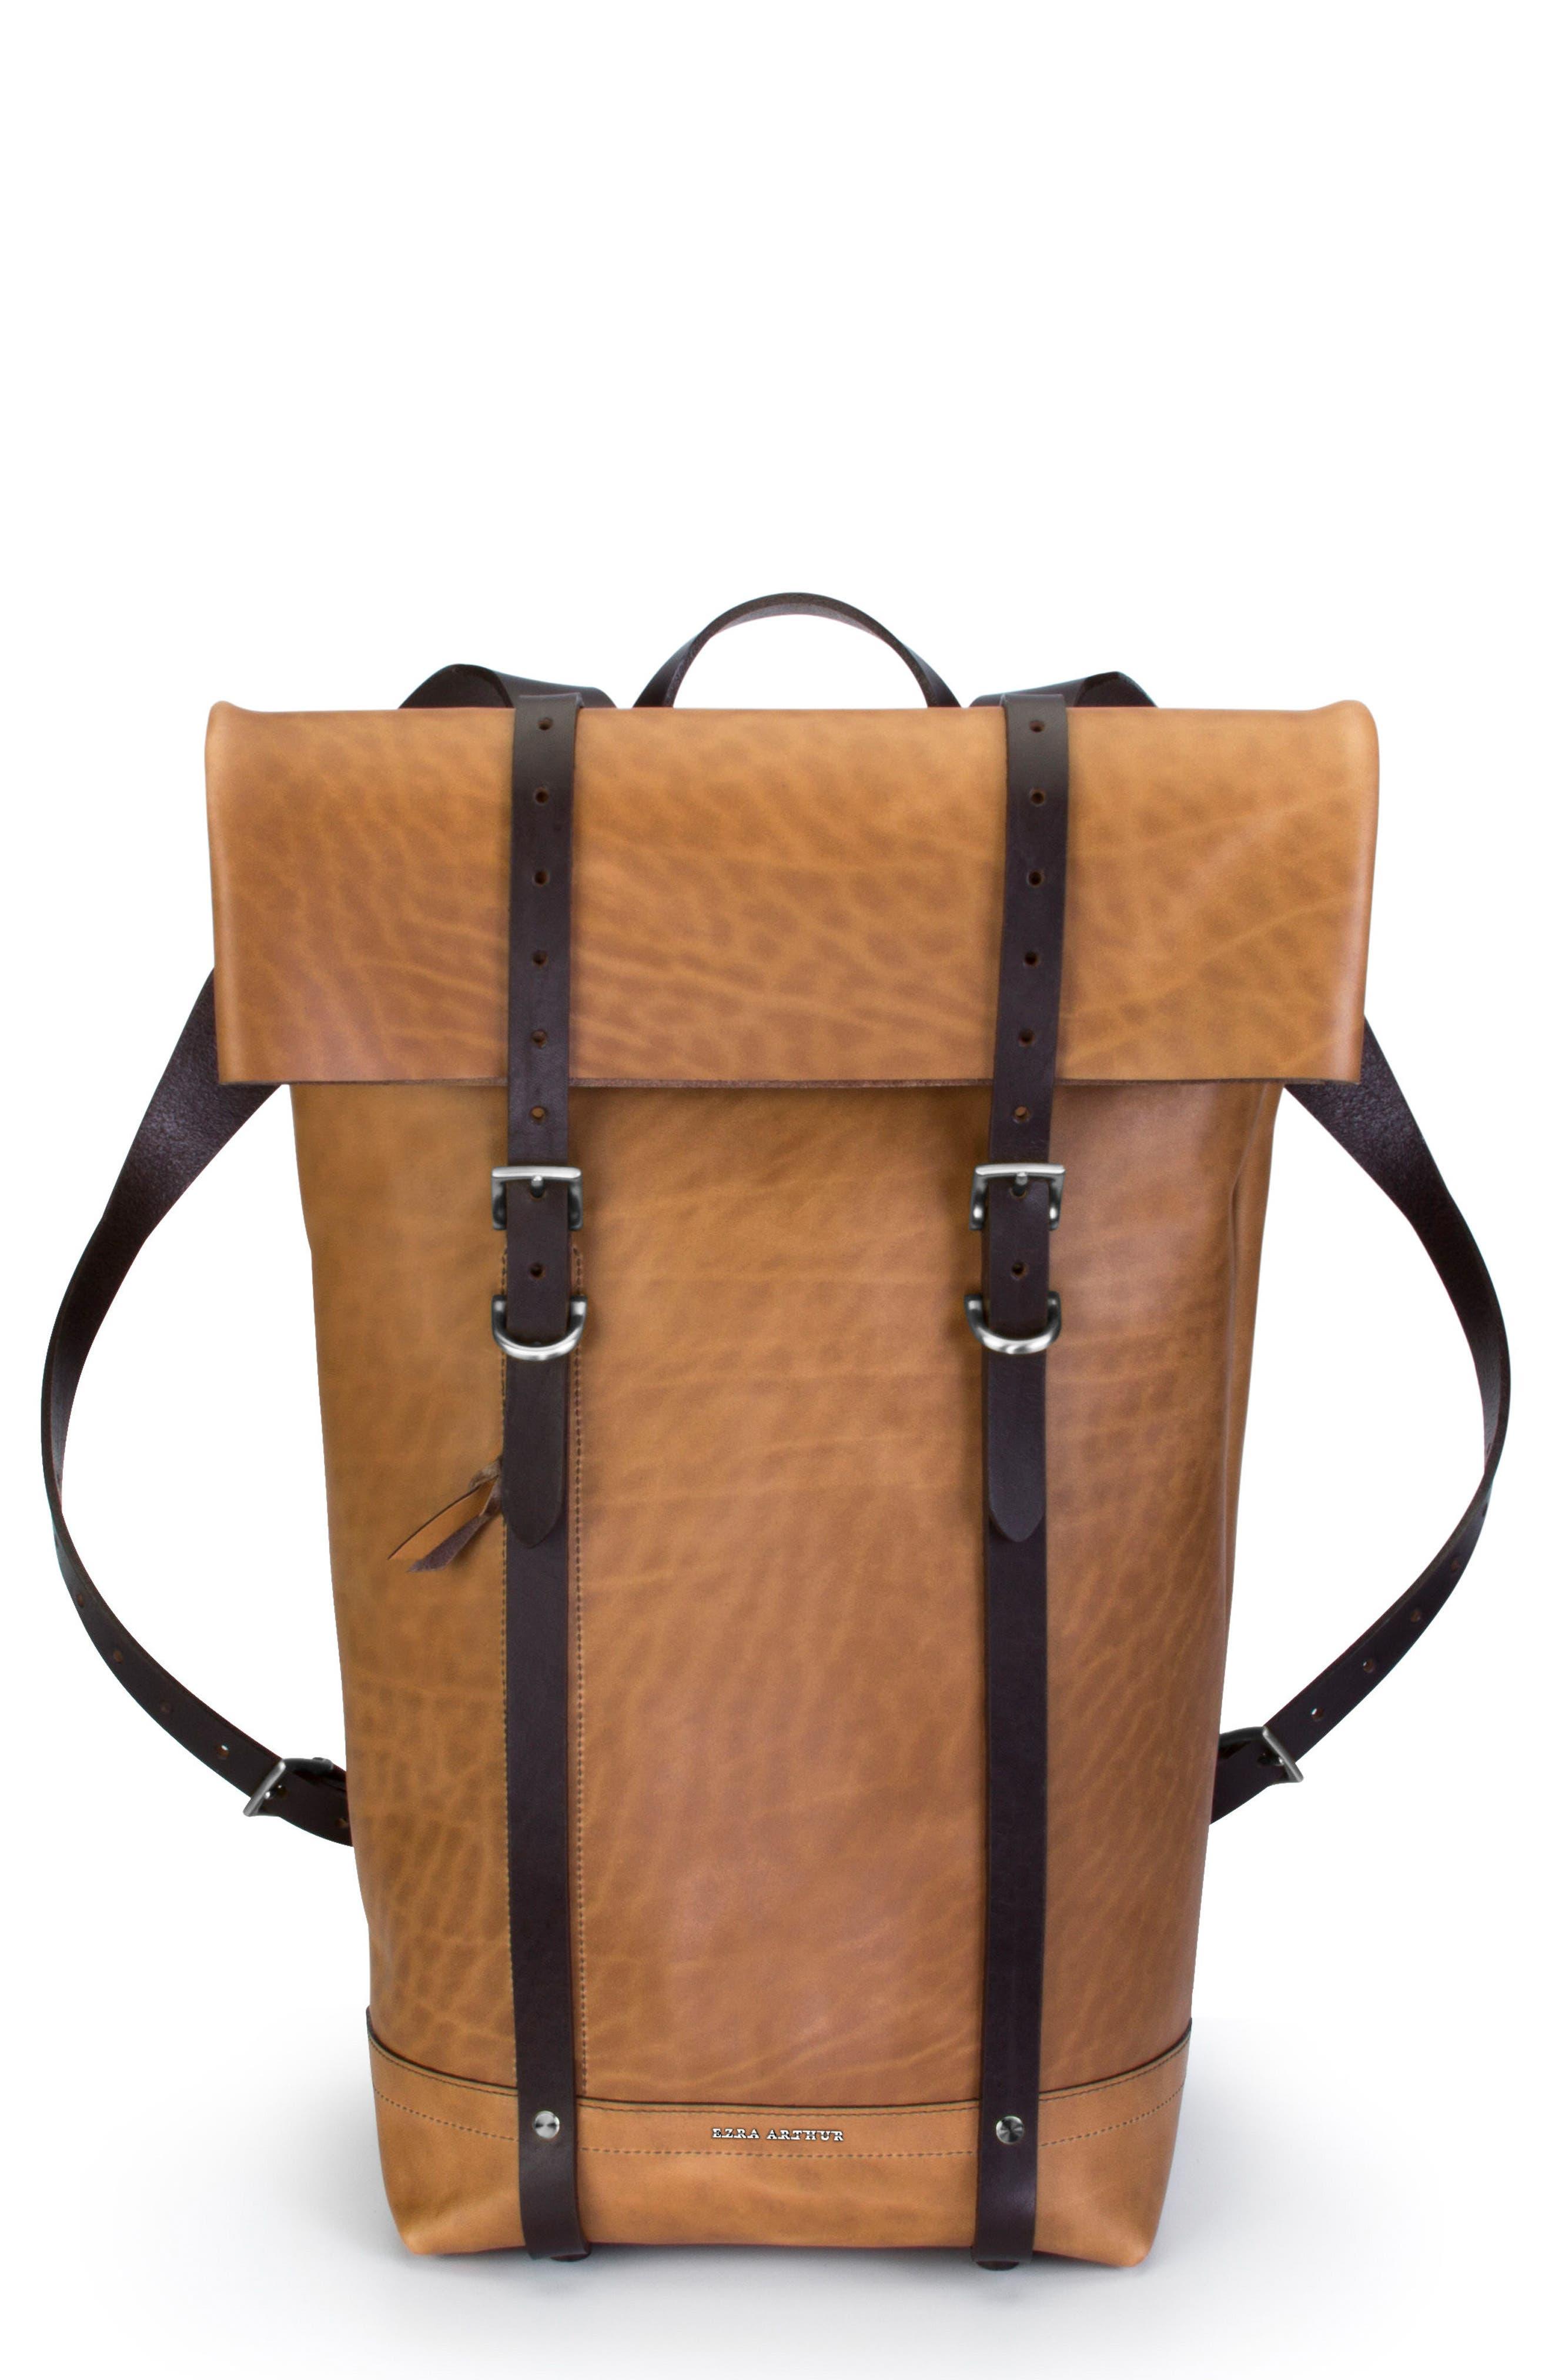 Keystone Nickel Detail Leather Rucksack,                             Main thumbnail 1, color,                             WHISKEY / NICKEL